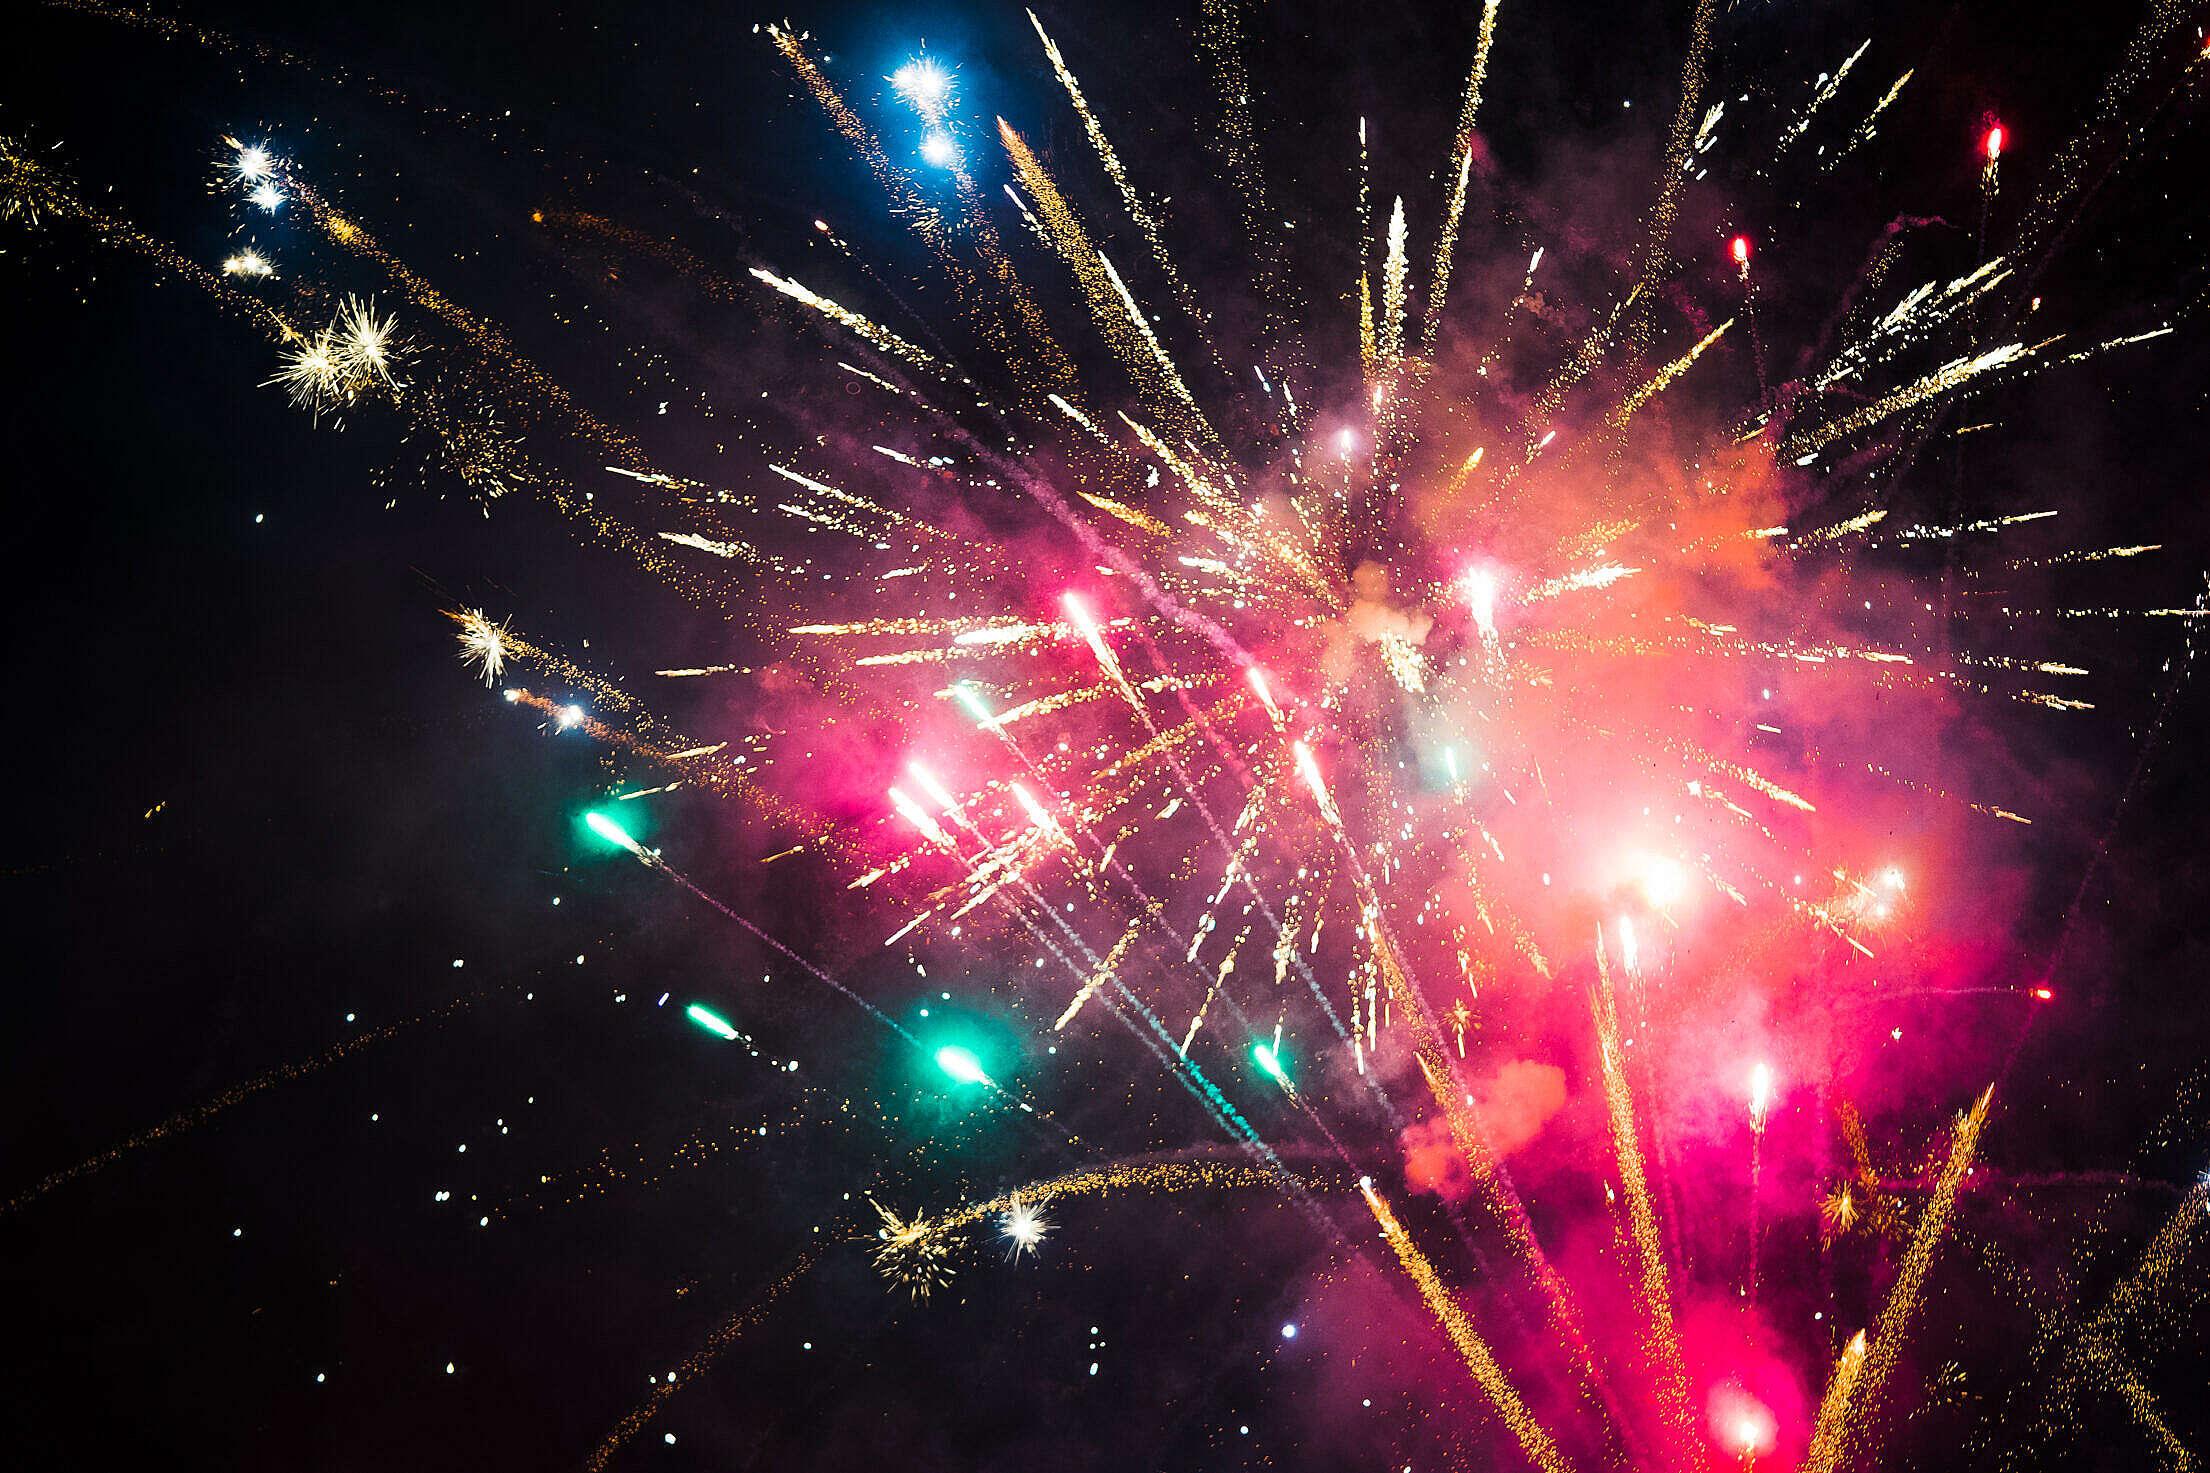 Fireworks Free Stock Photo